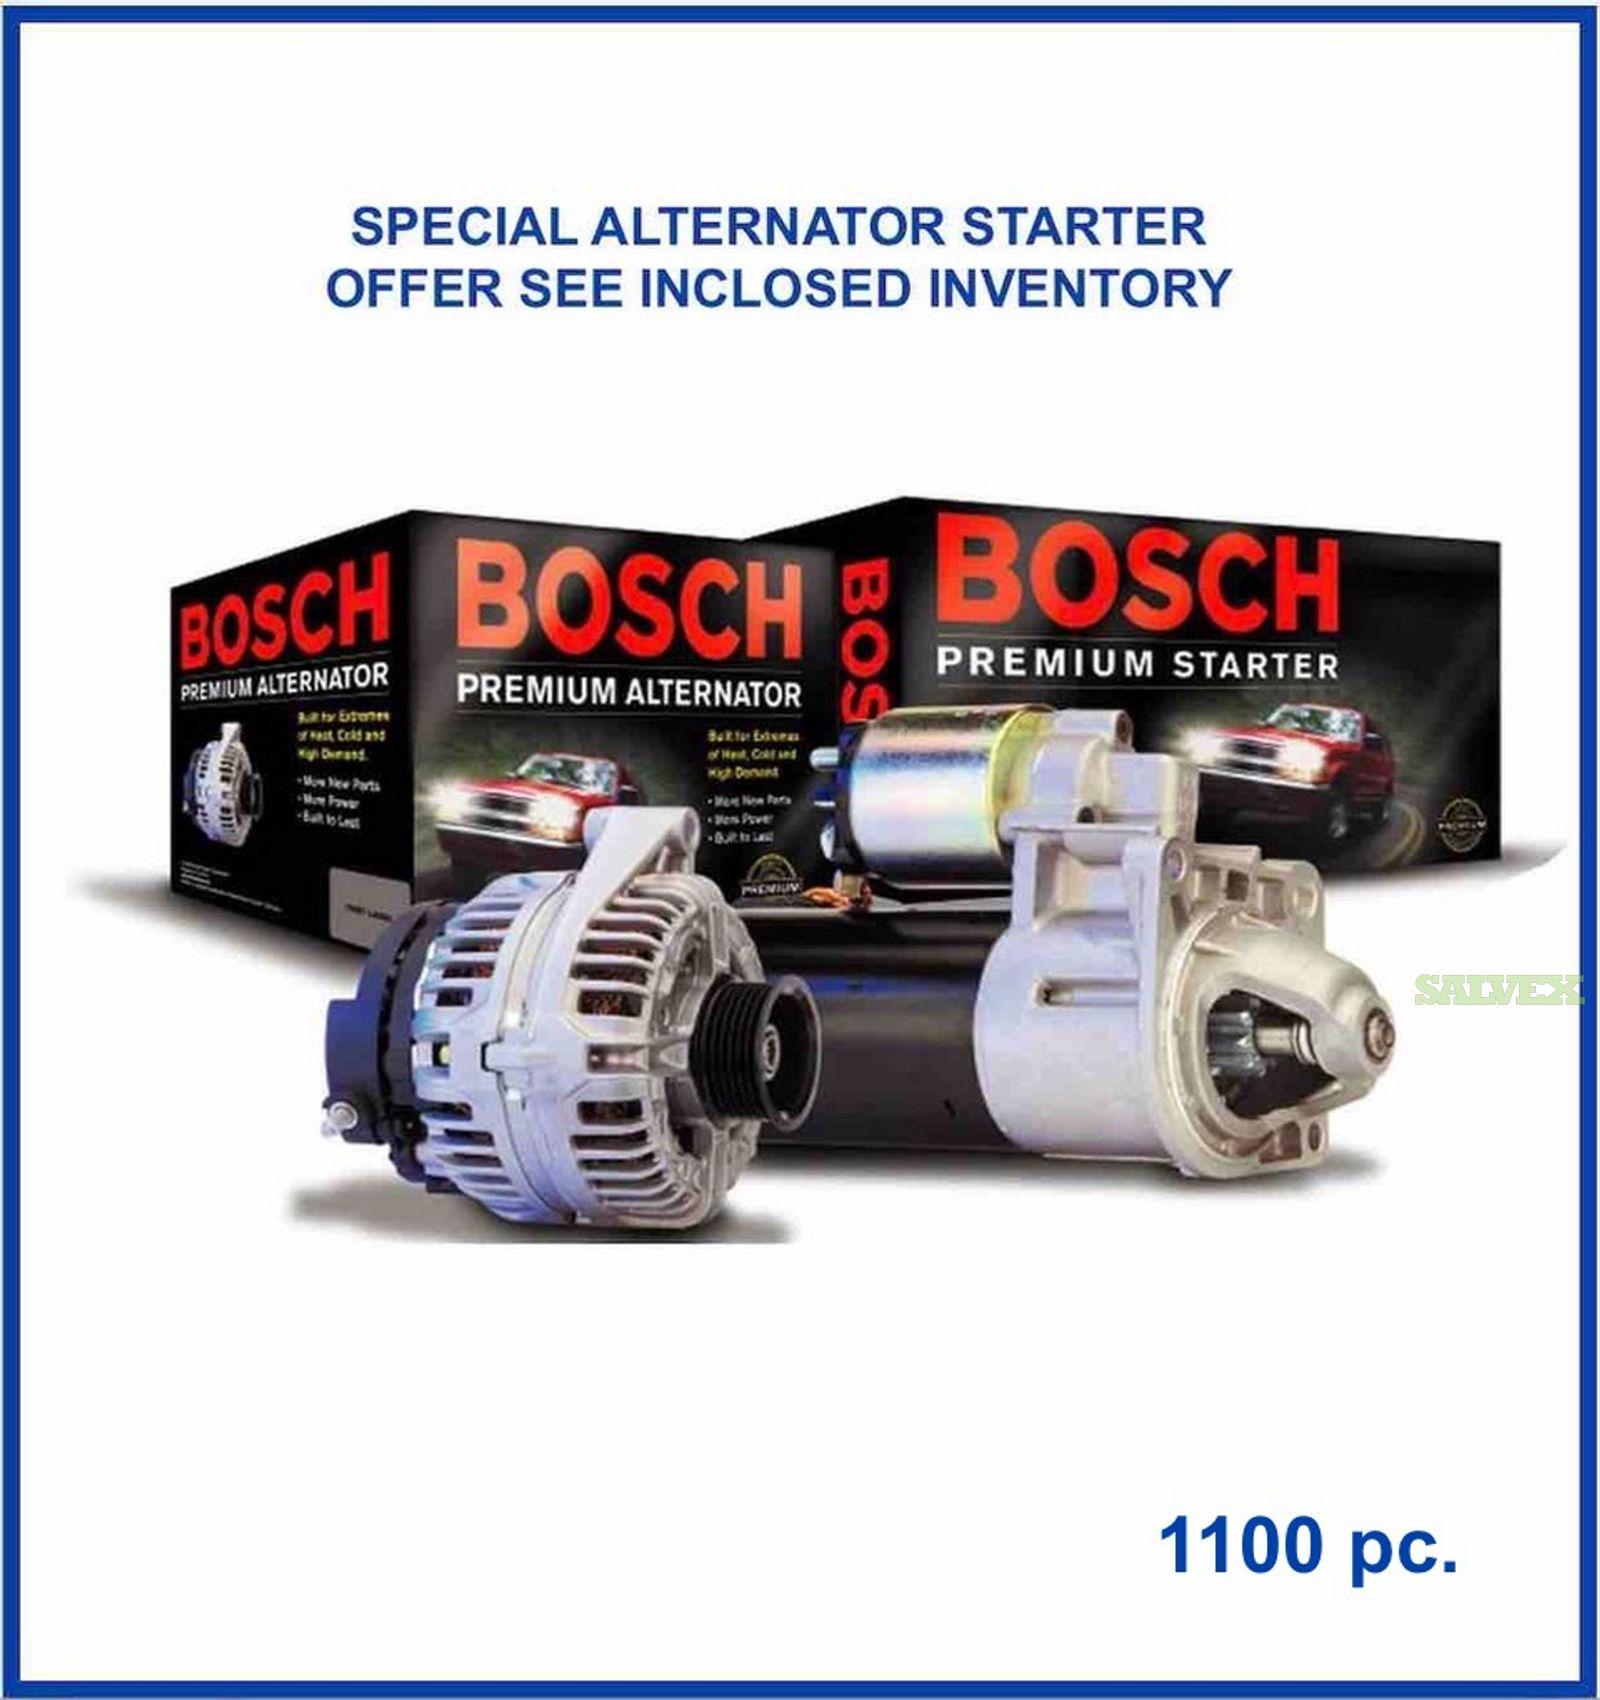 Bosch Starters and Alternators (1050 Pcs)